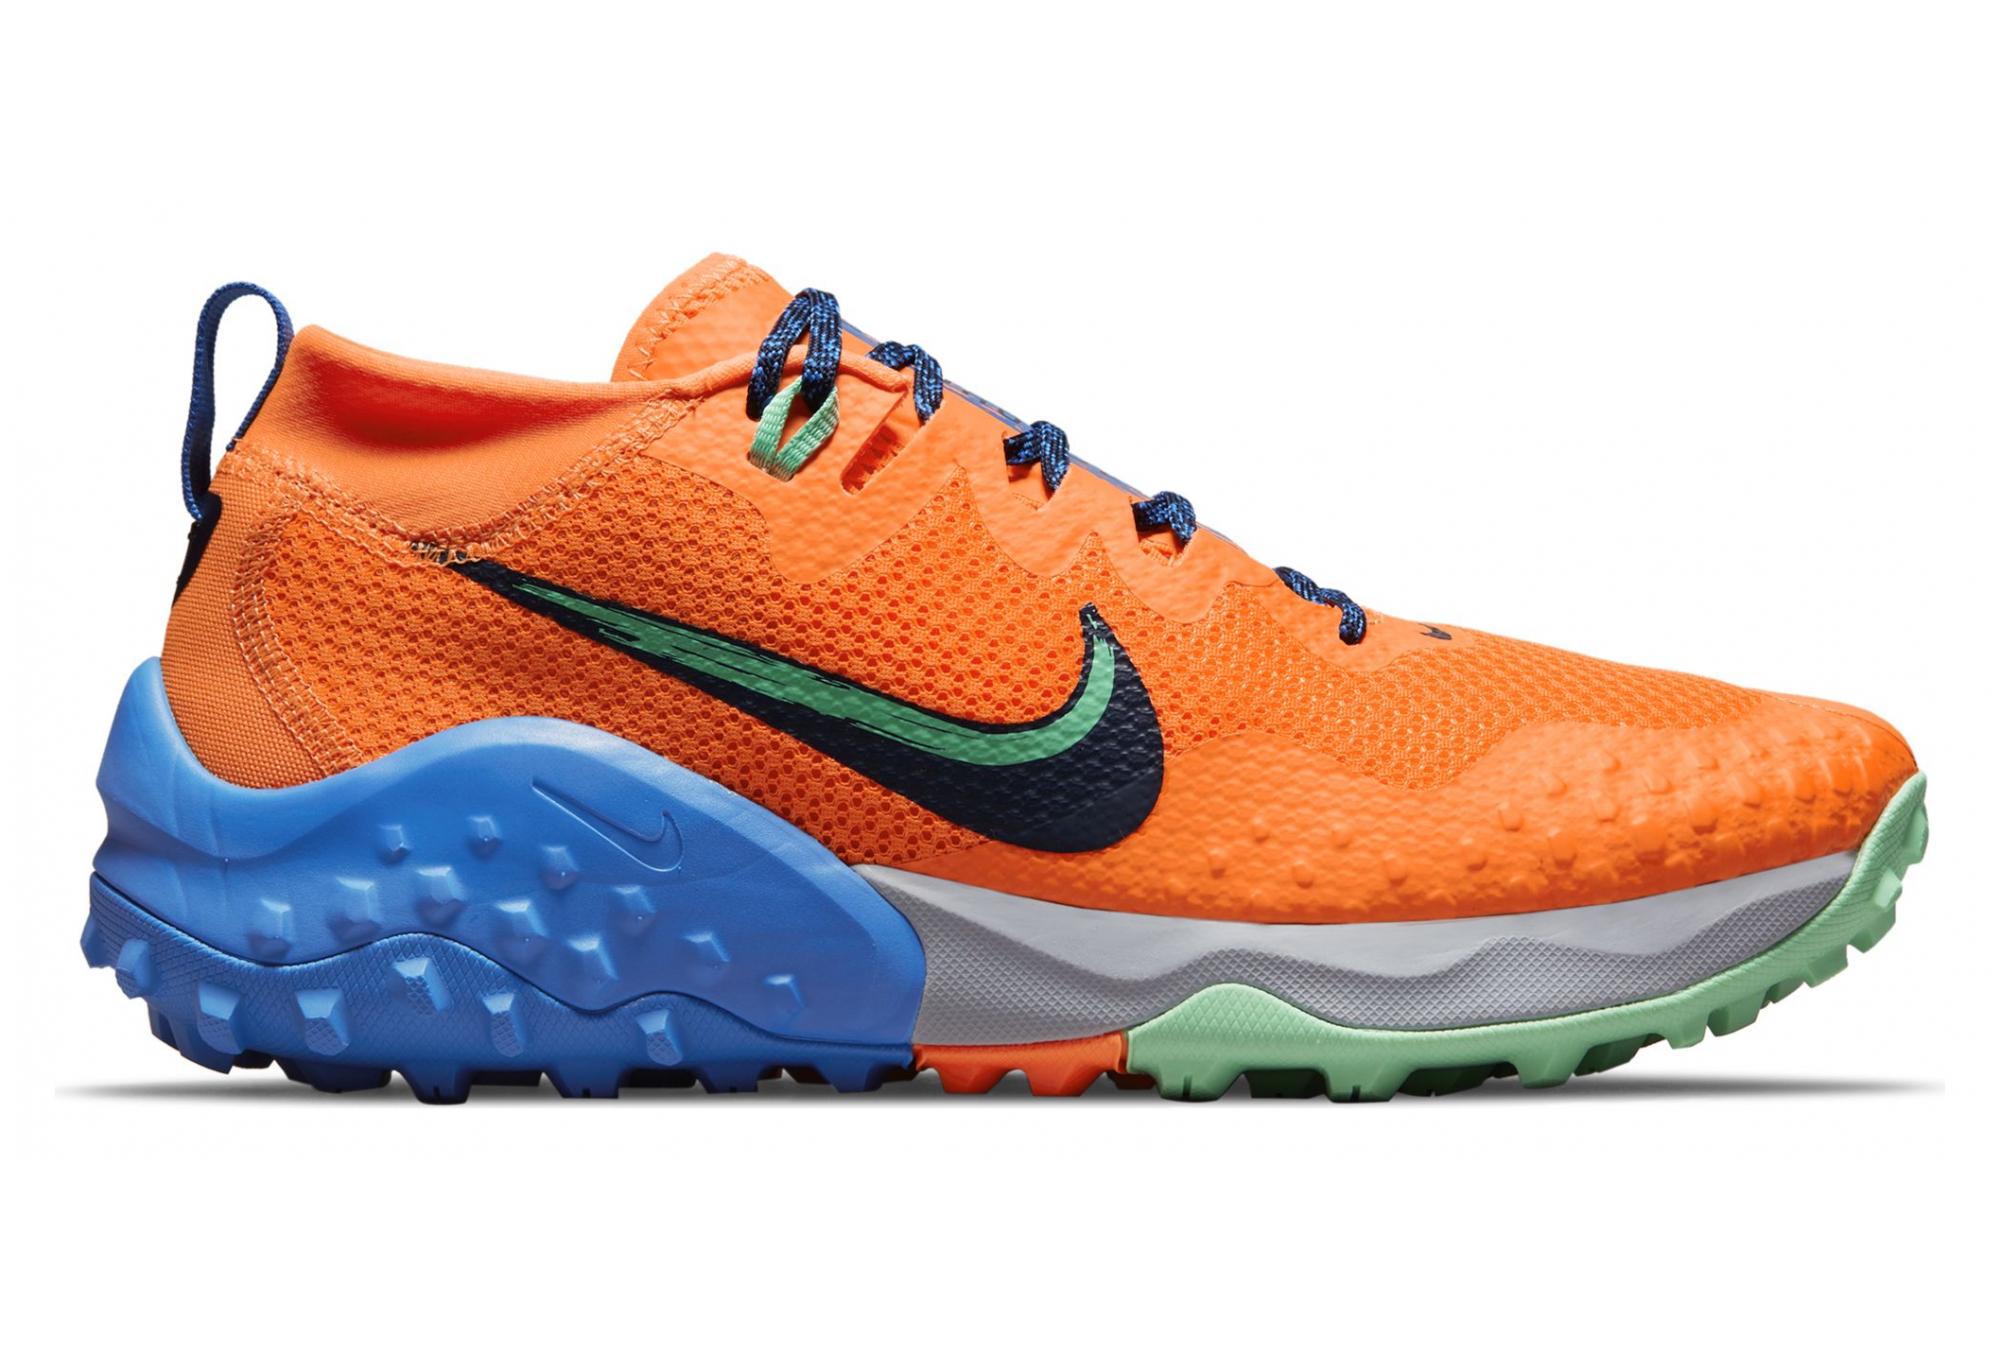 Nike Wildhorse 7 Trail Running Shoes Orange/Blue